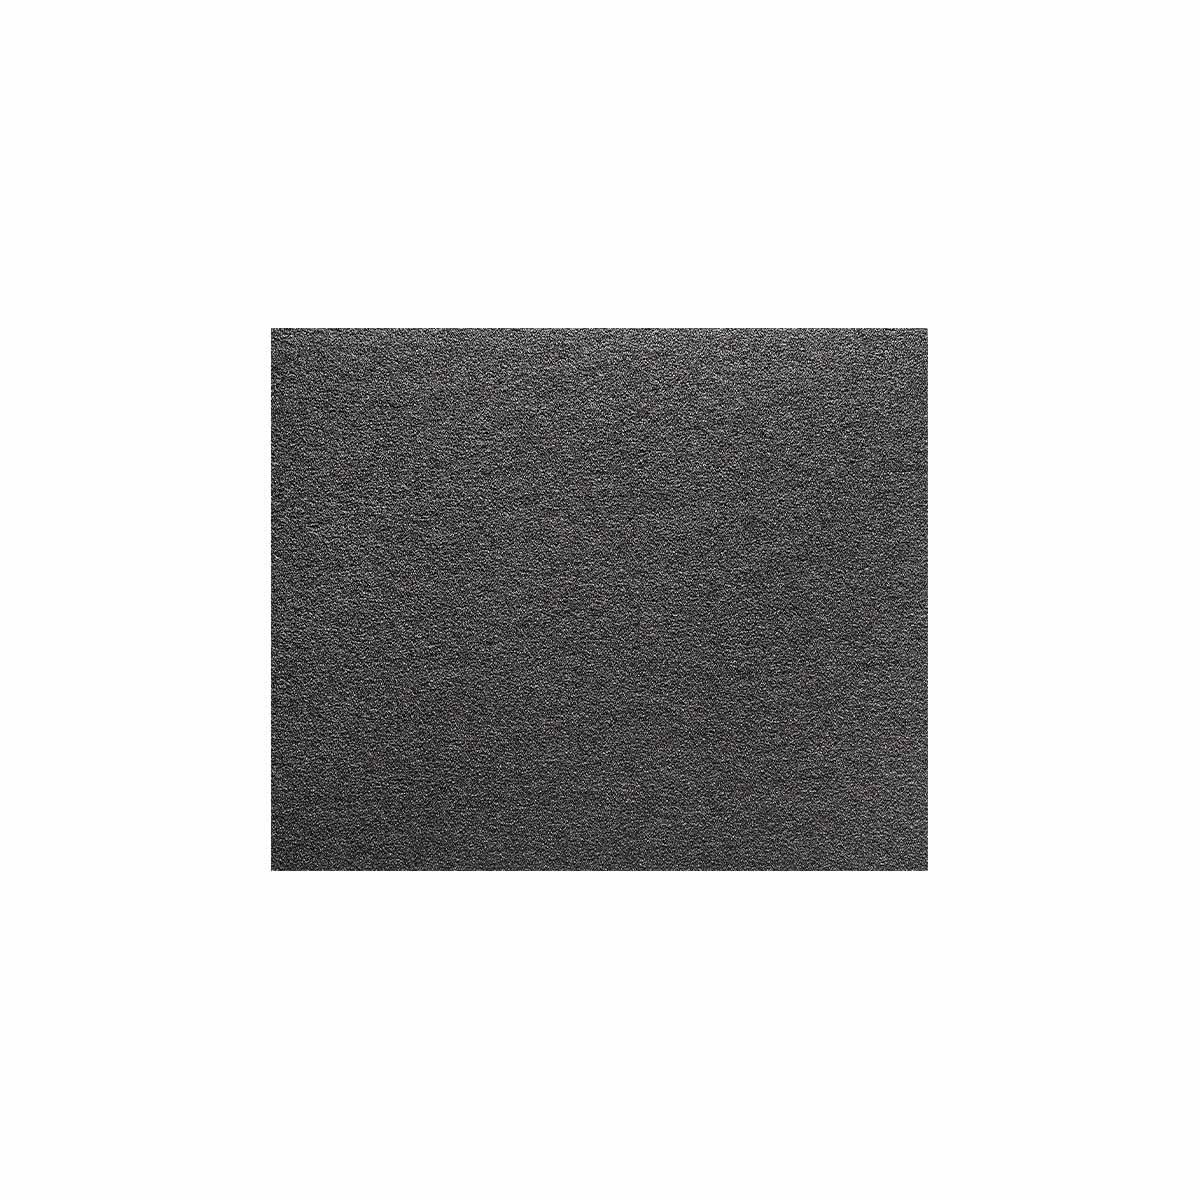 SANDING CLOTH SHEET 23X28CM 25PCS